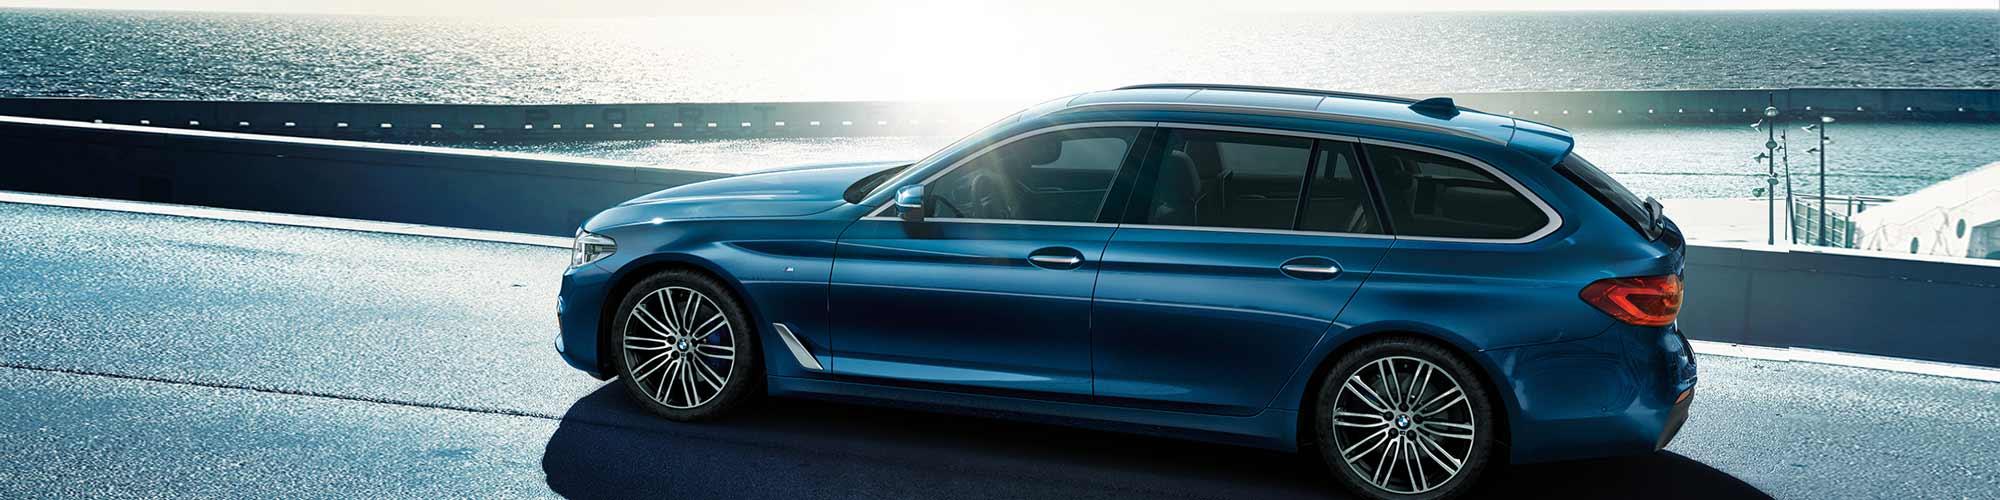 BMW 5er Touring im Autohaus Märtin